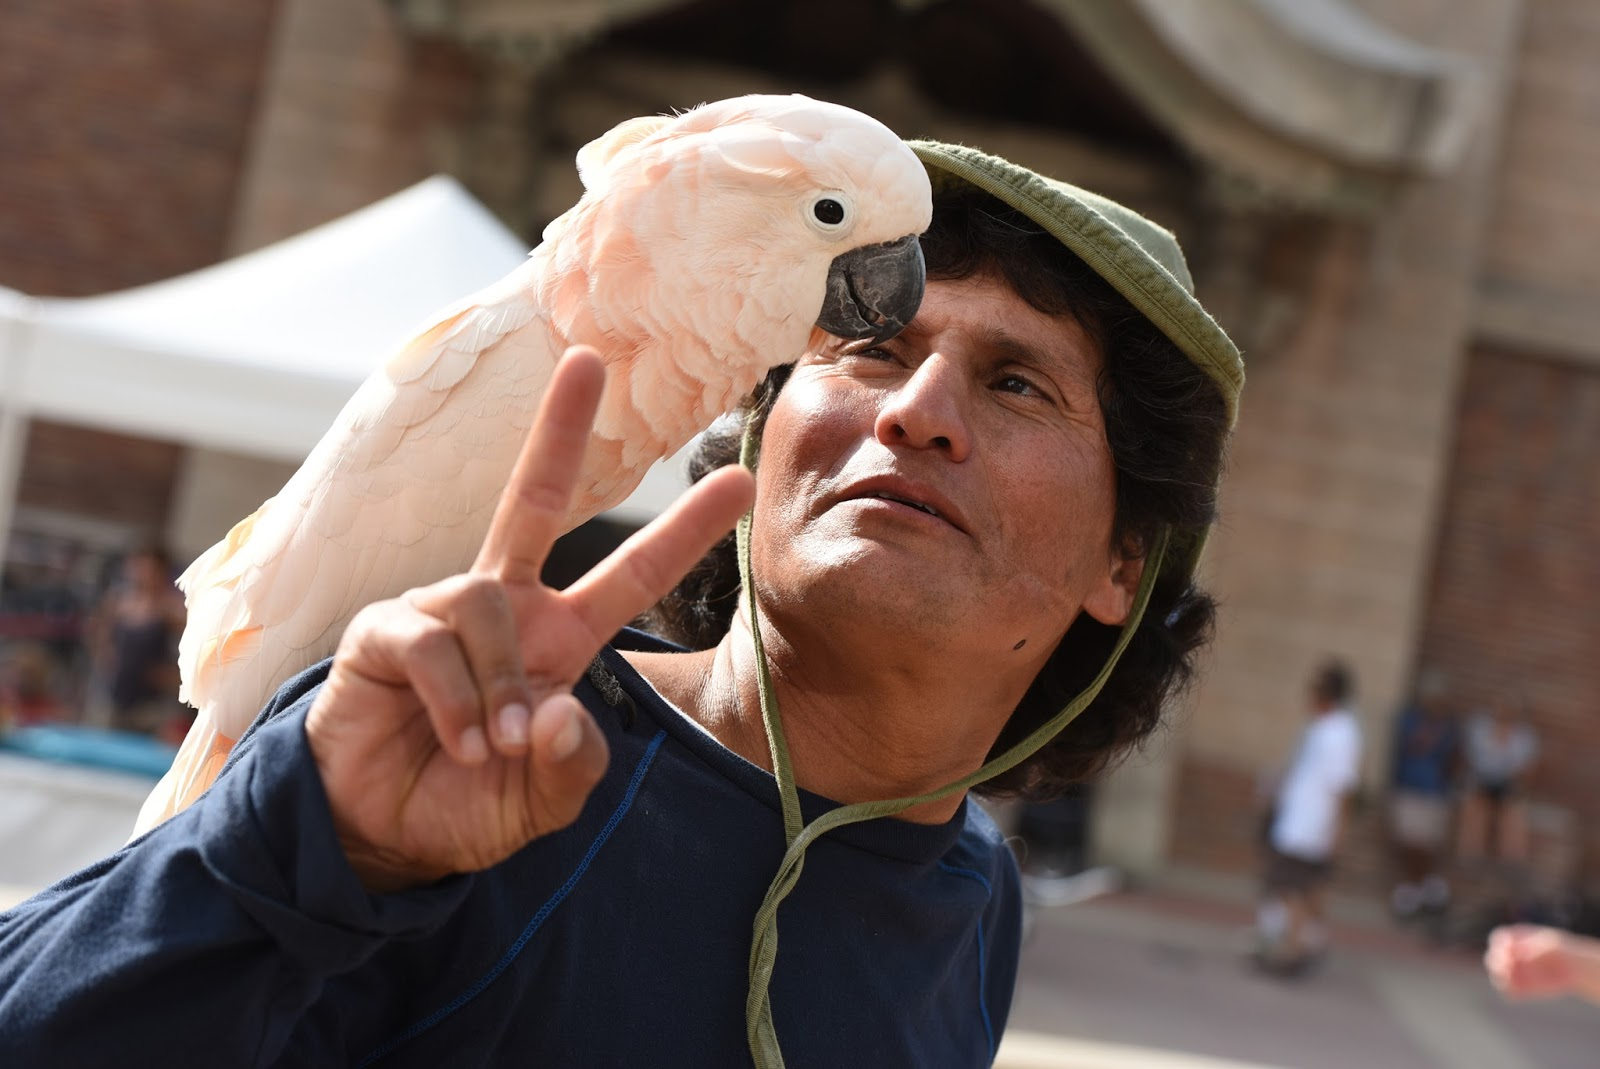 man-parrot-15-HR